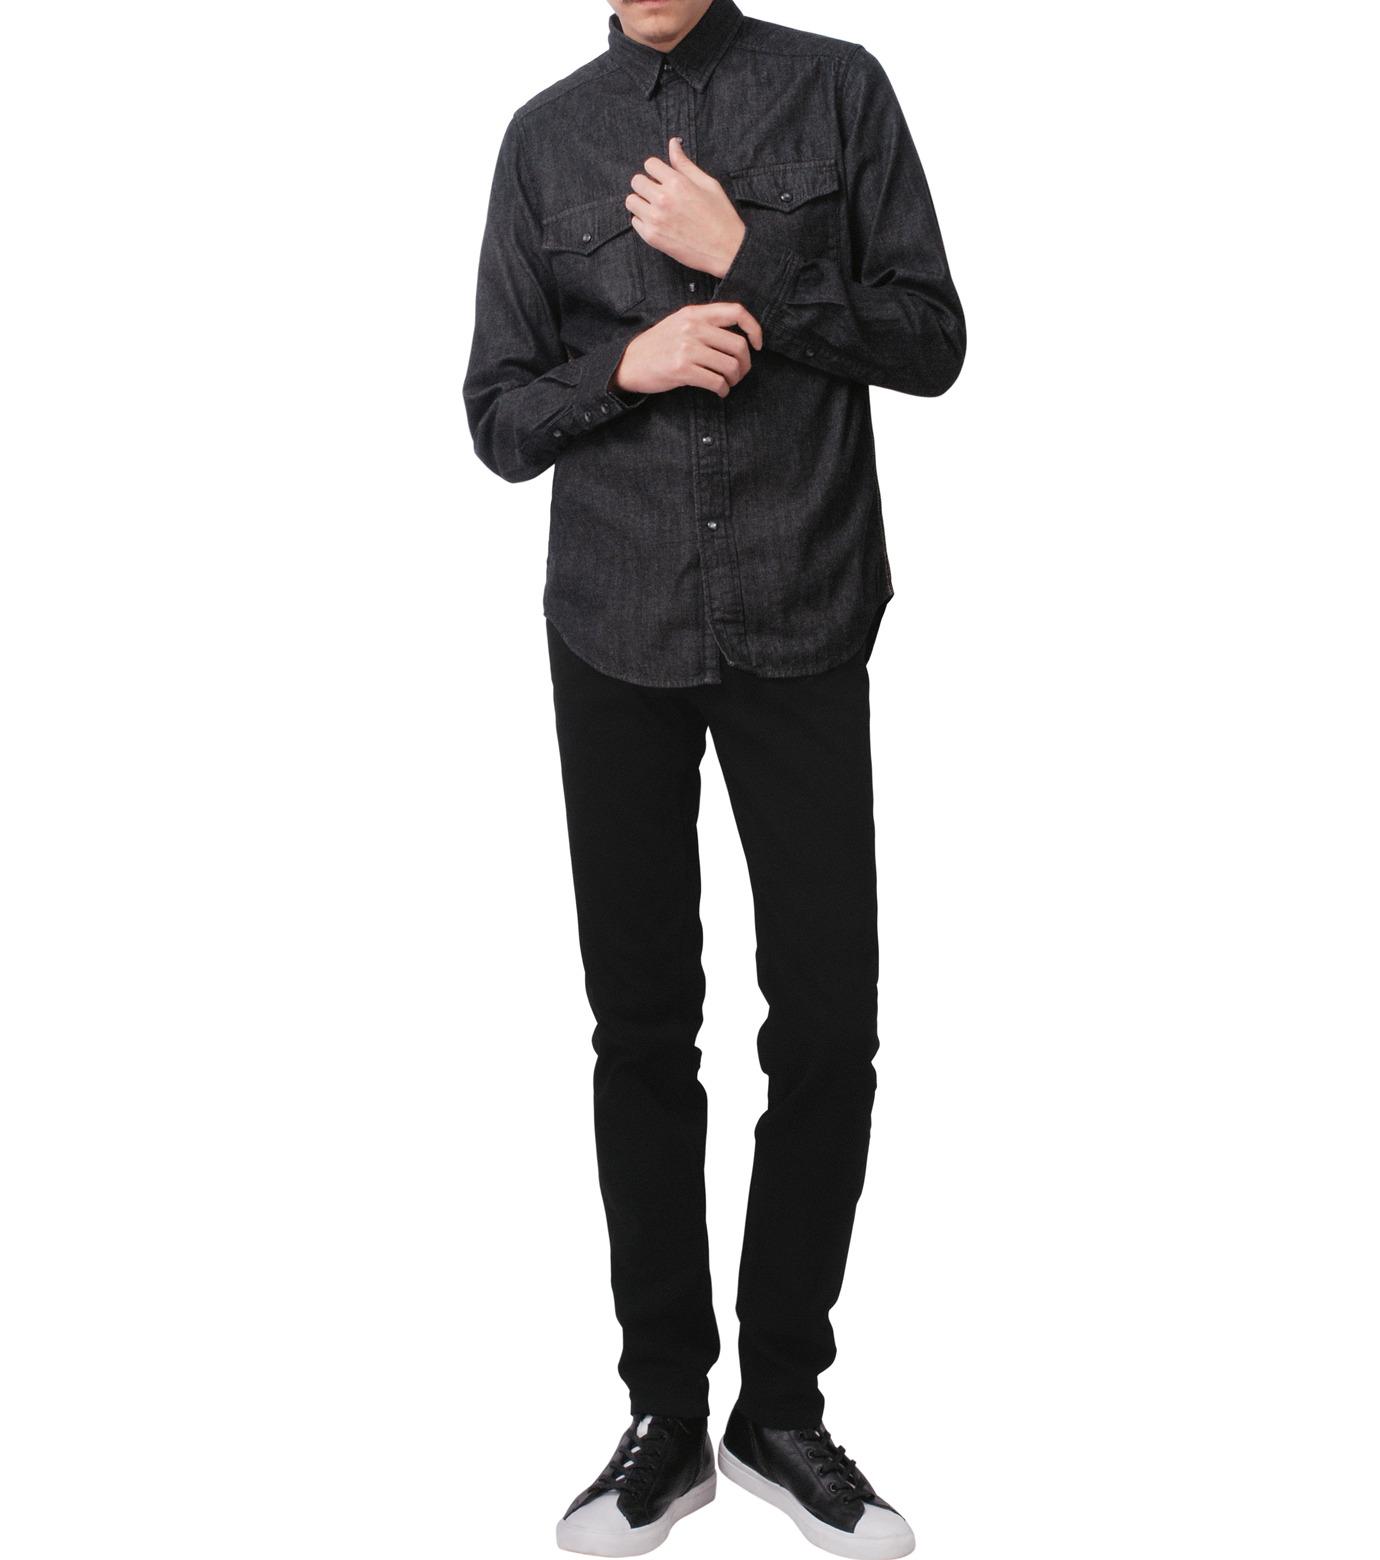 HL HEDDIE LOVU(エイチエル・エディールーヴ)のBLACK DENIM SLIM-BLACK(パンツ/pants)-17A98007-13 拡大詳細画像3